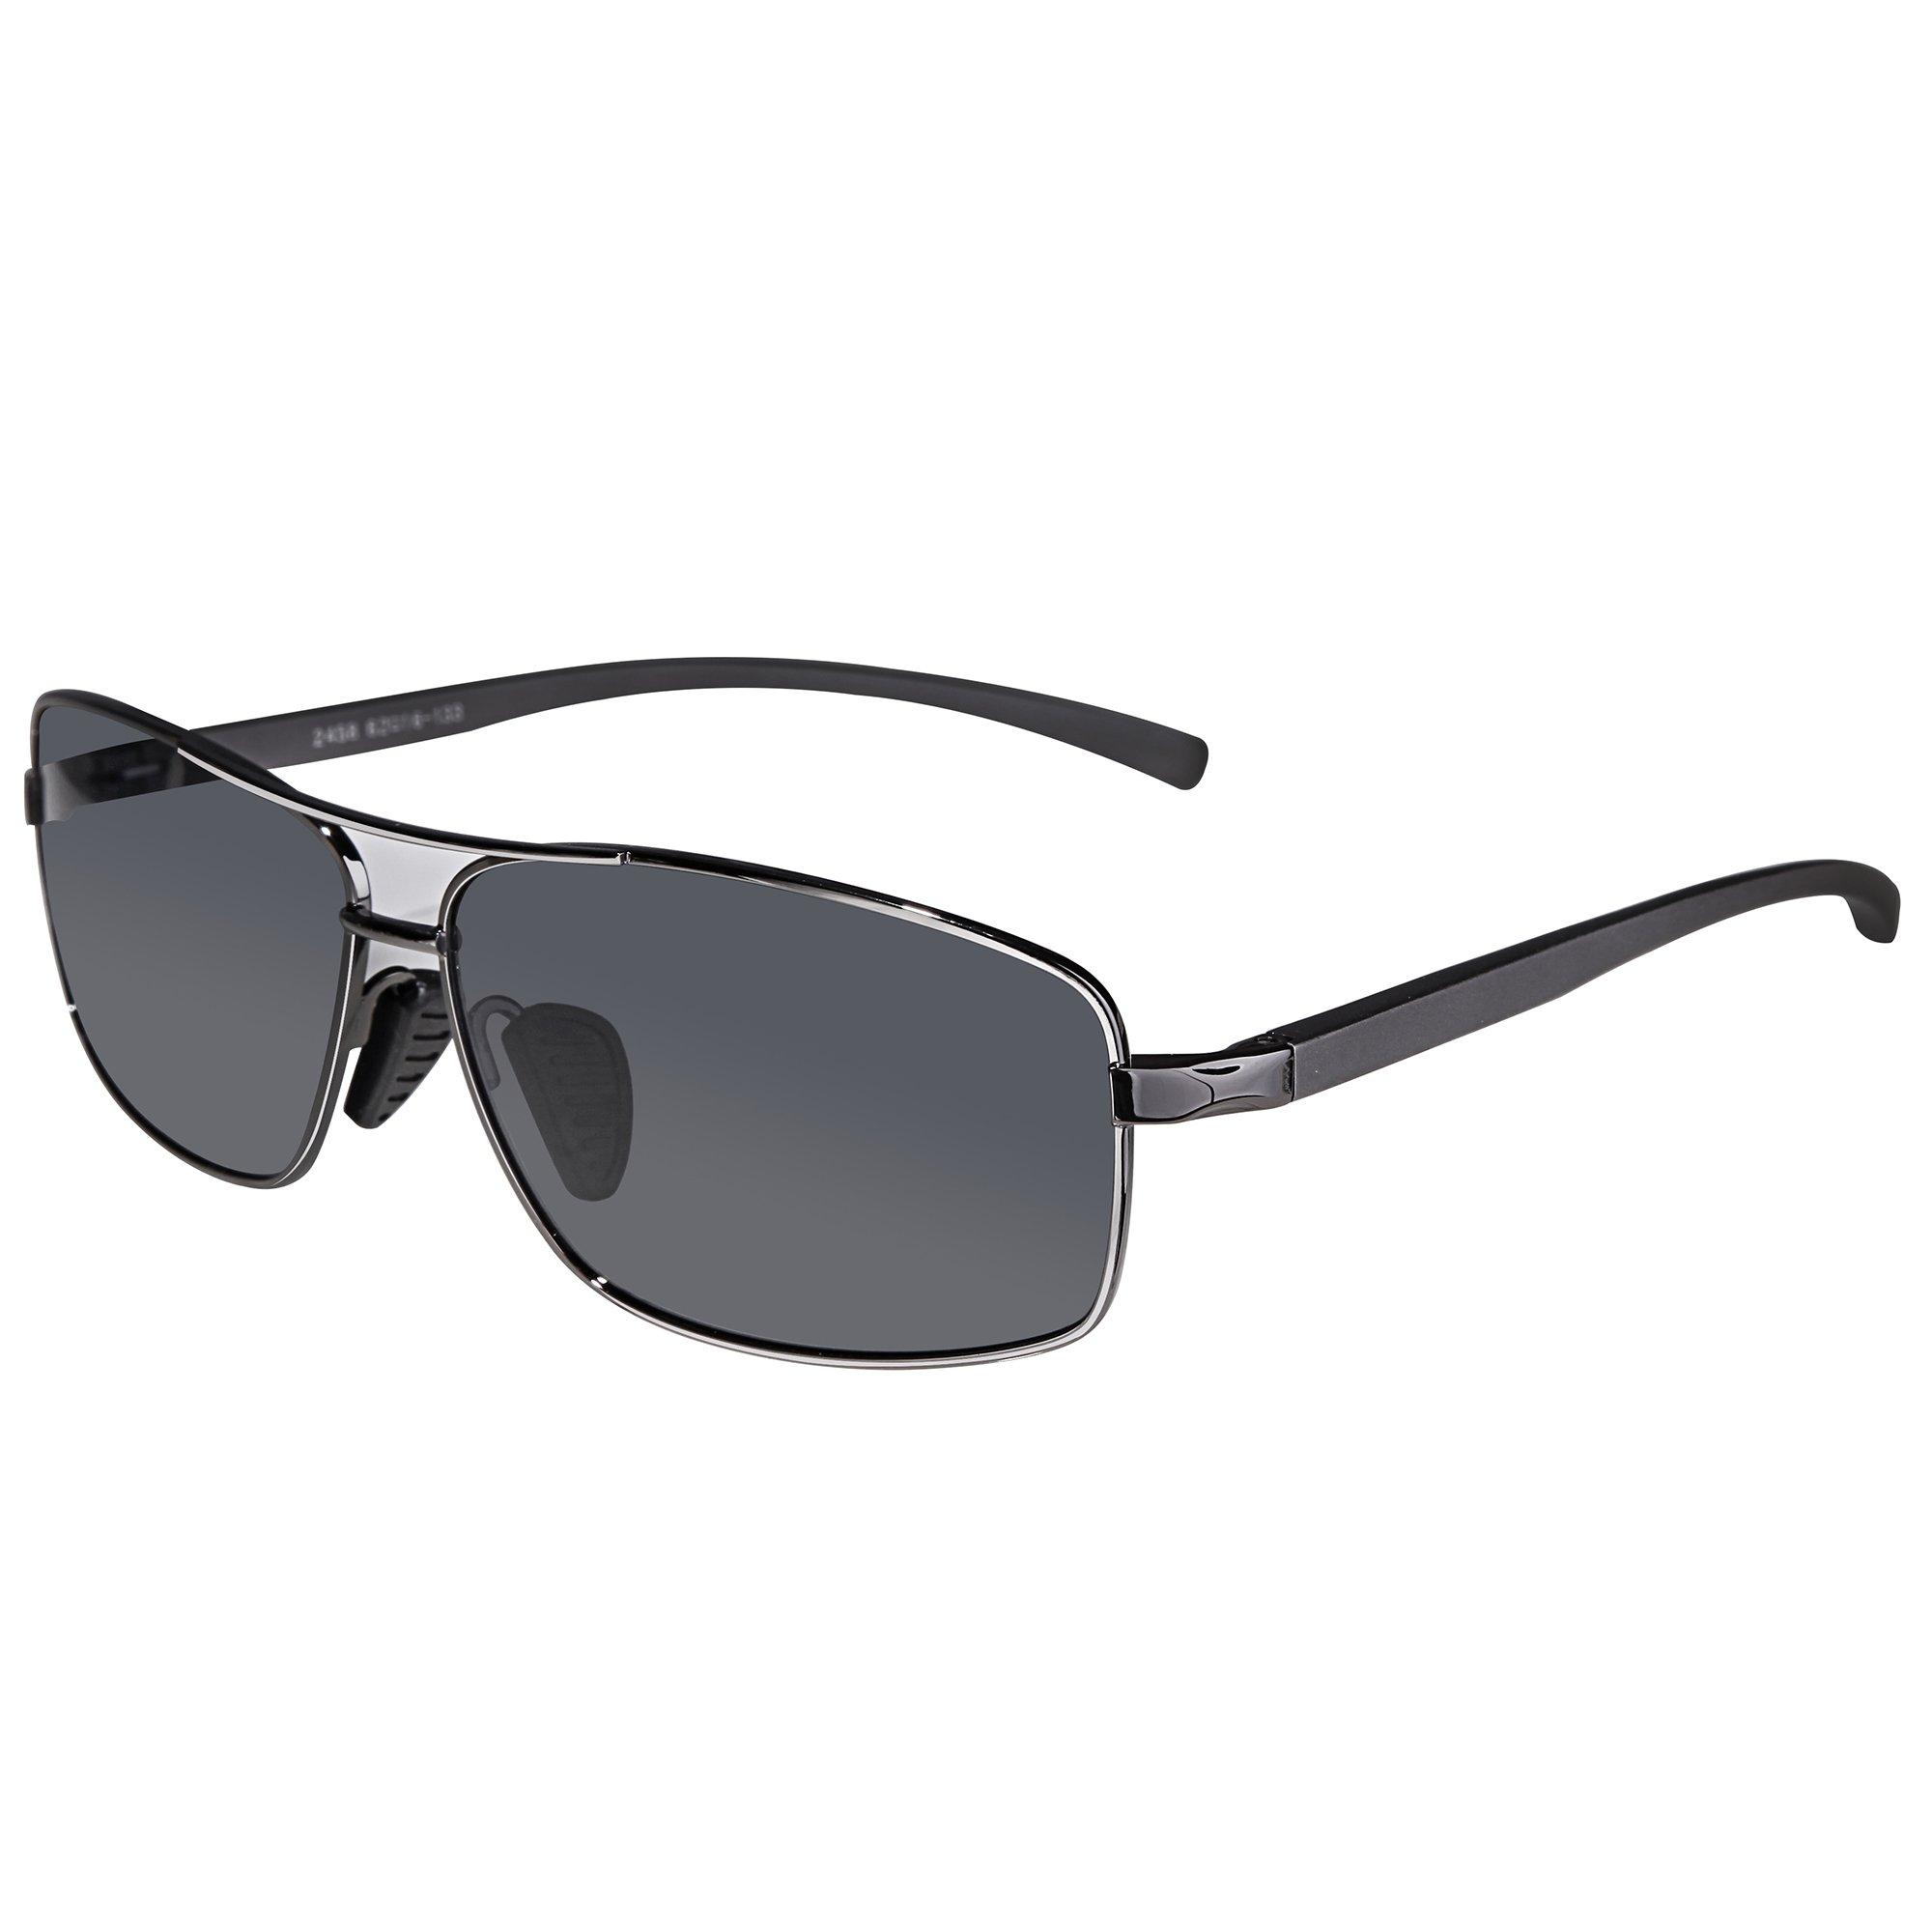 35357e103abf Get Quotations · SUNGAIT Ultra Lightweight Rectangular Polarized Sunglasses  100% UV protection